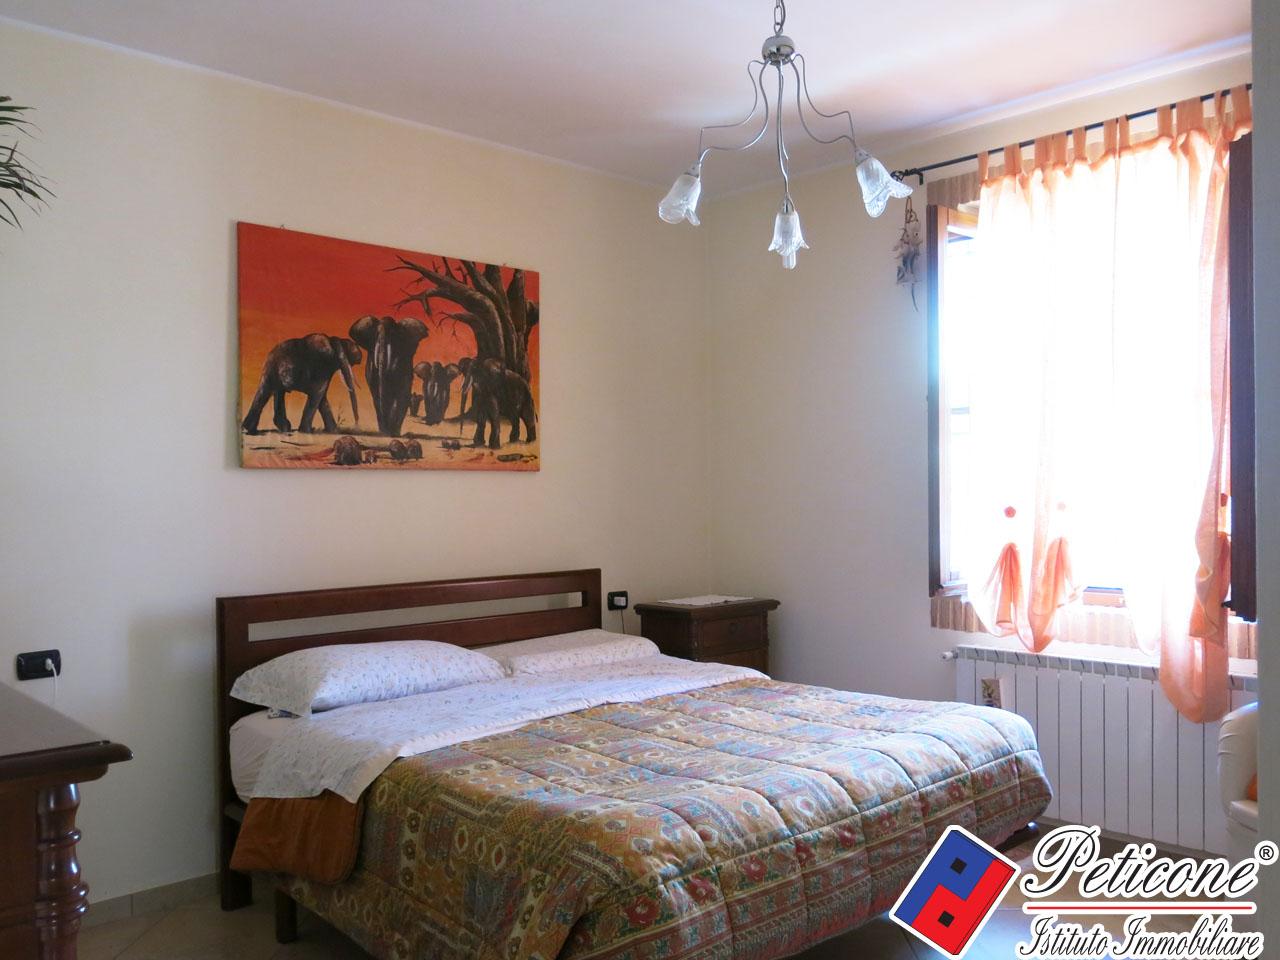 Villa in Vendita a Fondi: 3 locali, 107 mq - Foto 8